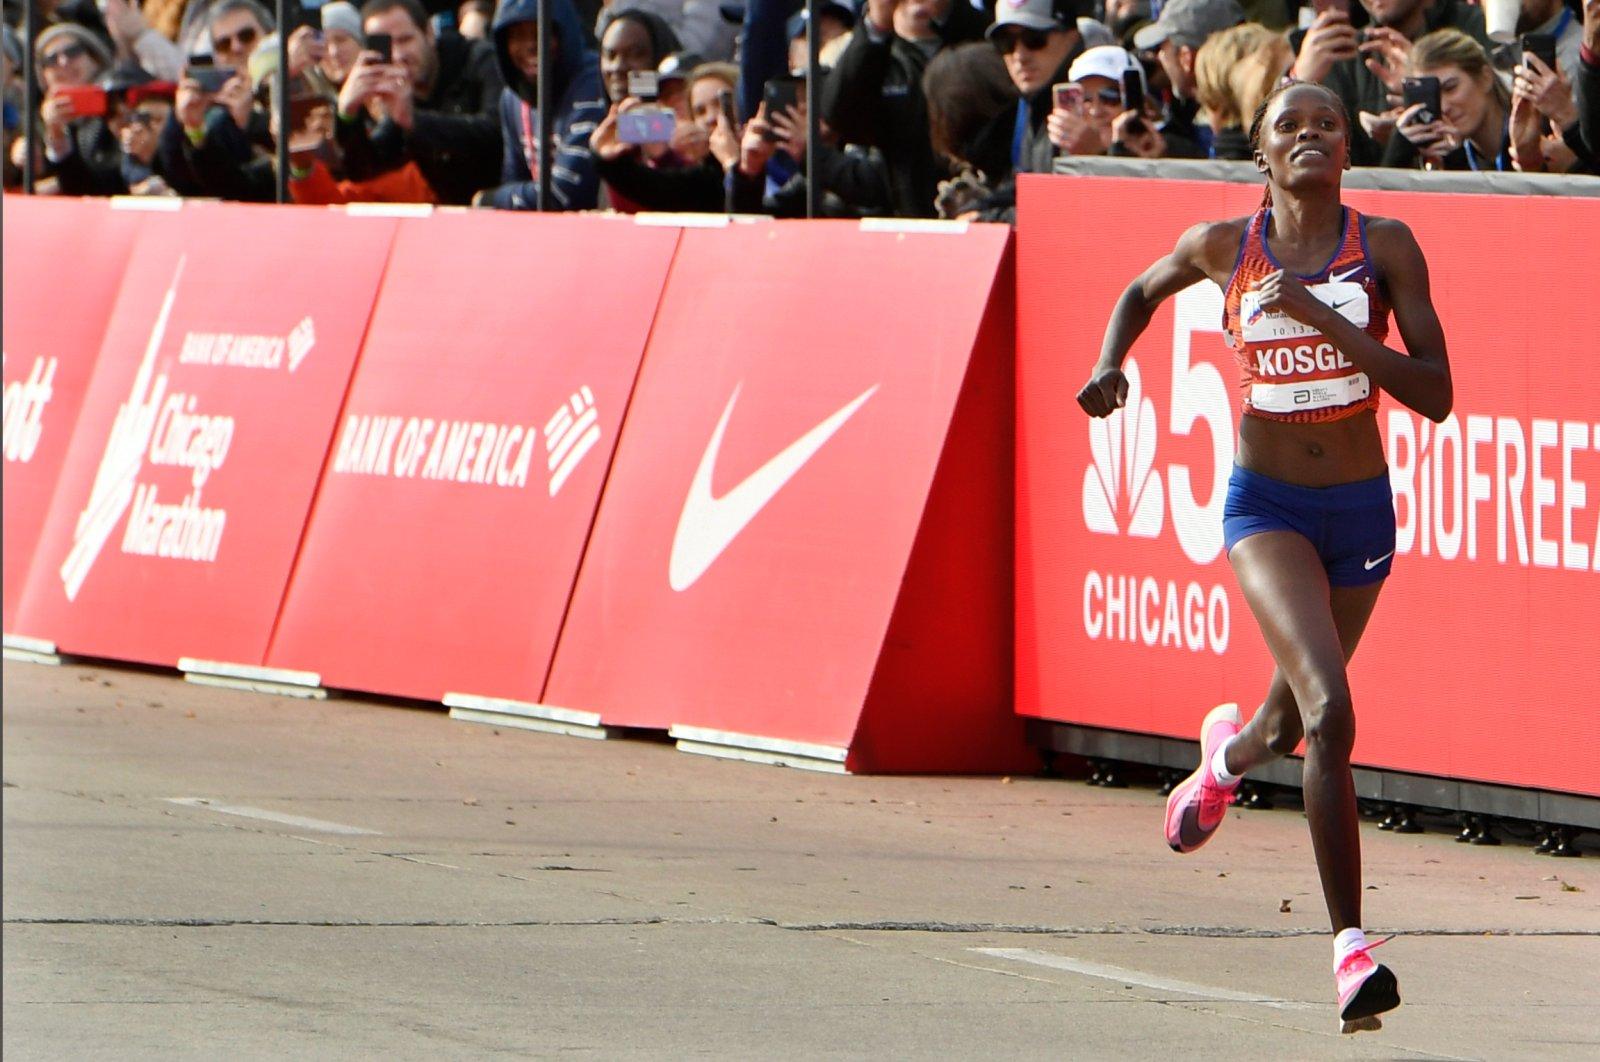 Brigid Kosgei of Kenya wins the Women's Chicago Marathon while setting a world record of 2:14:04, Chicago, U.S., Oct. 13, 2019. (AP Photo)